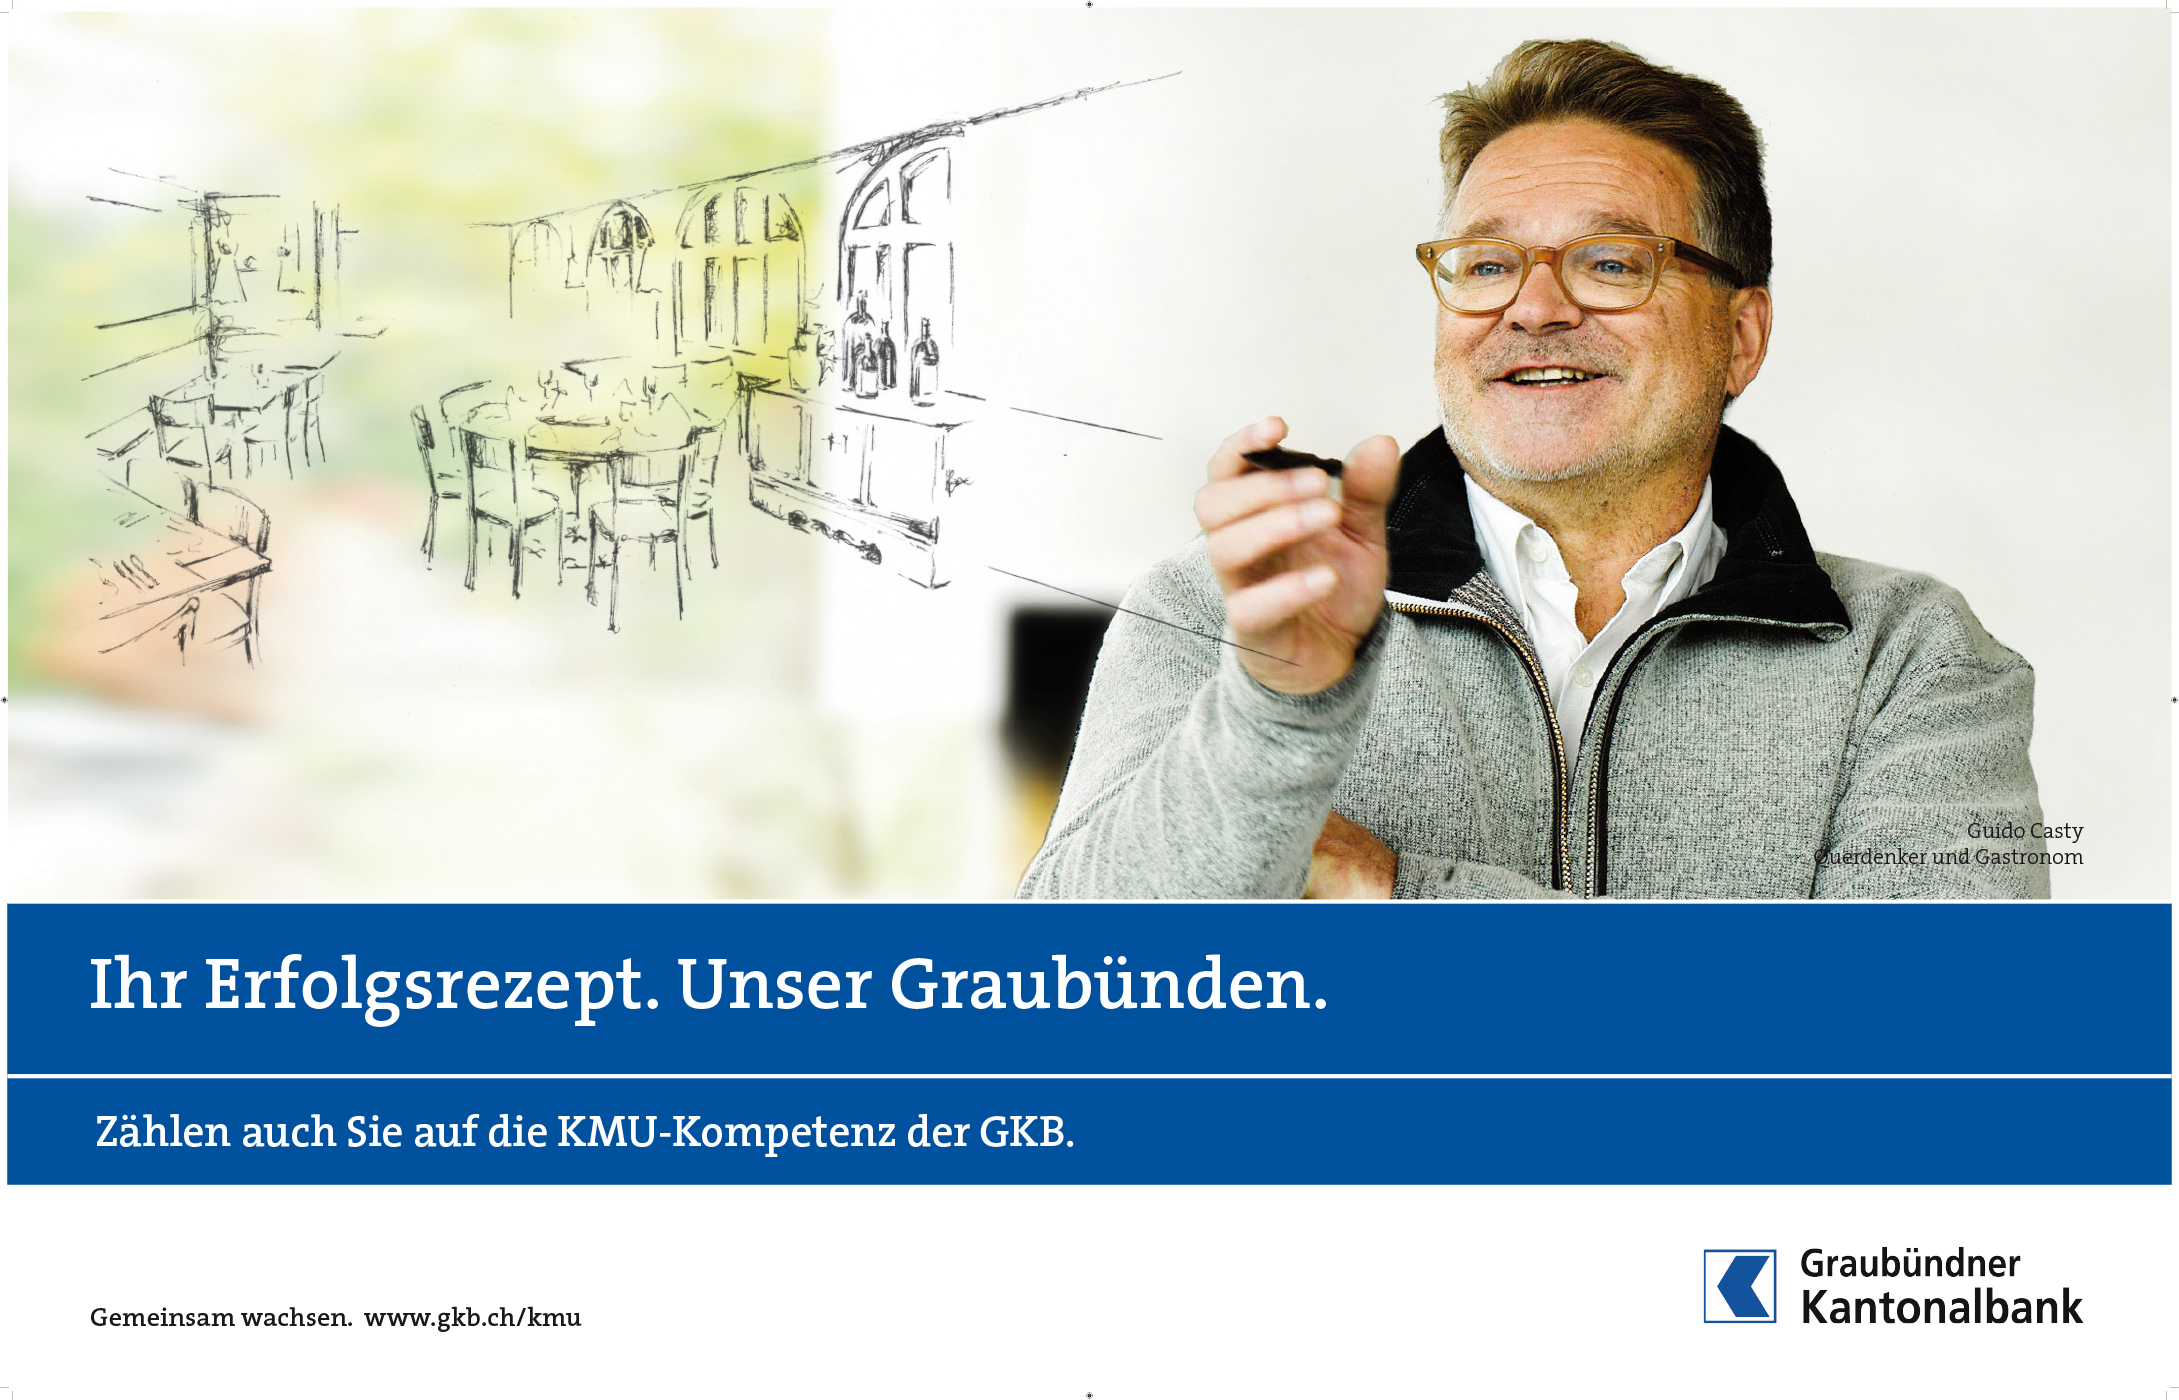 _Gkb_Universalkampagne_GzA2-7_0.jpg